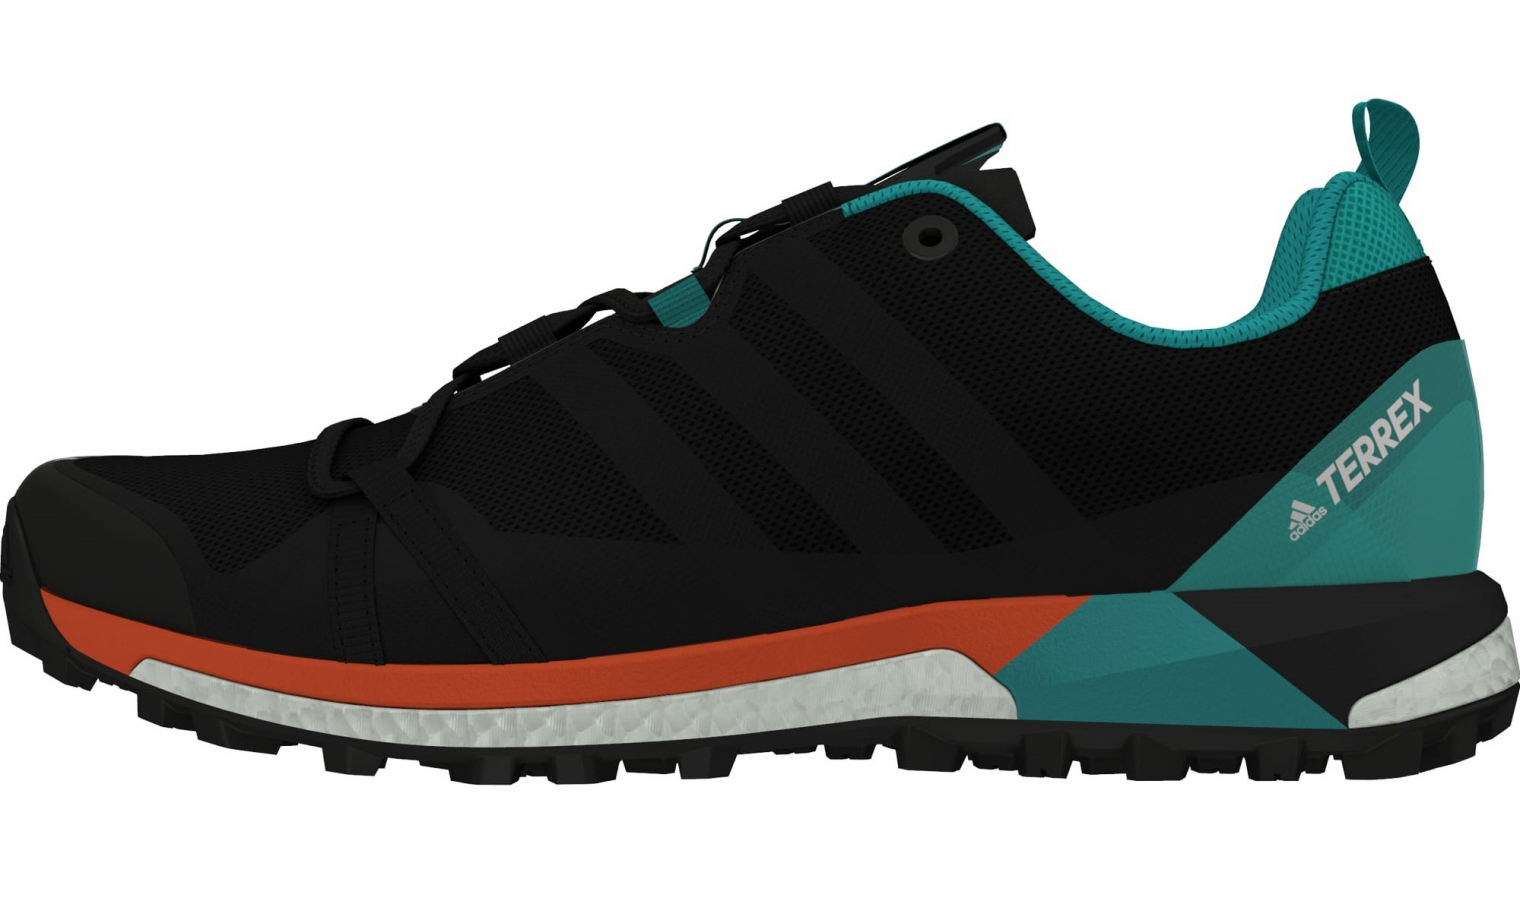 ... Pánske bežecké topánky adidas Terrex AGRAVIC čierne. 0 EUR Zľava 5c03b0ac2d7